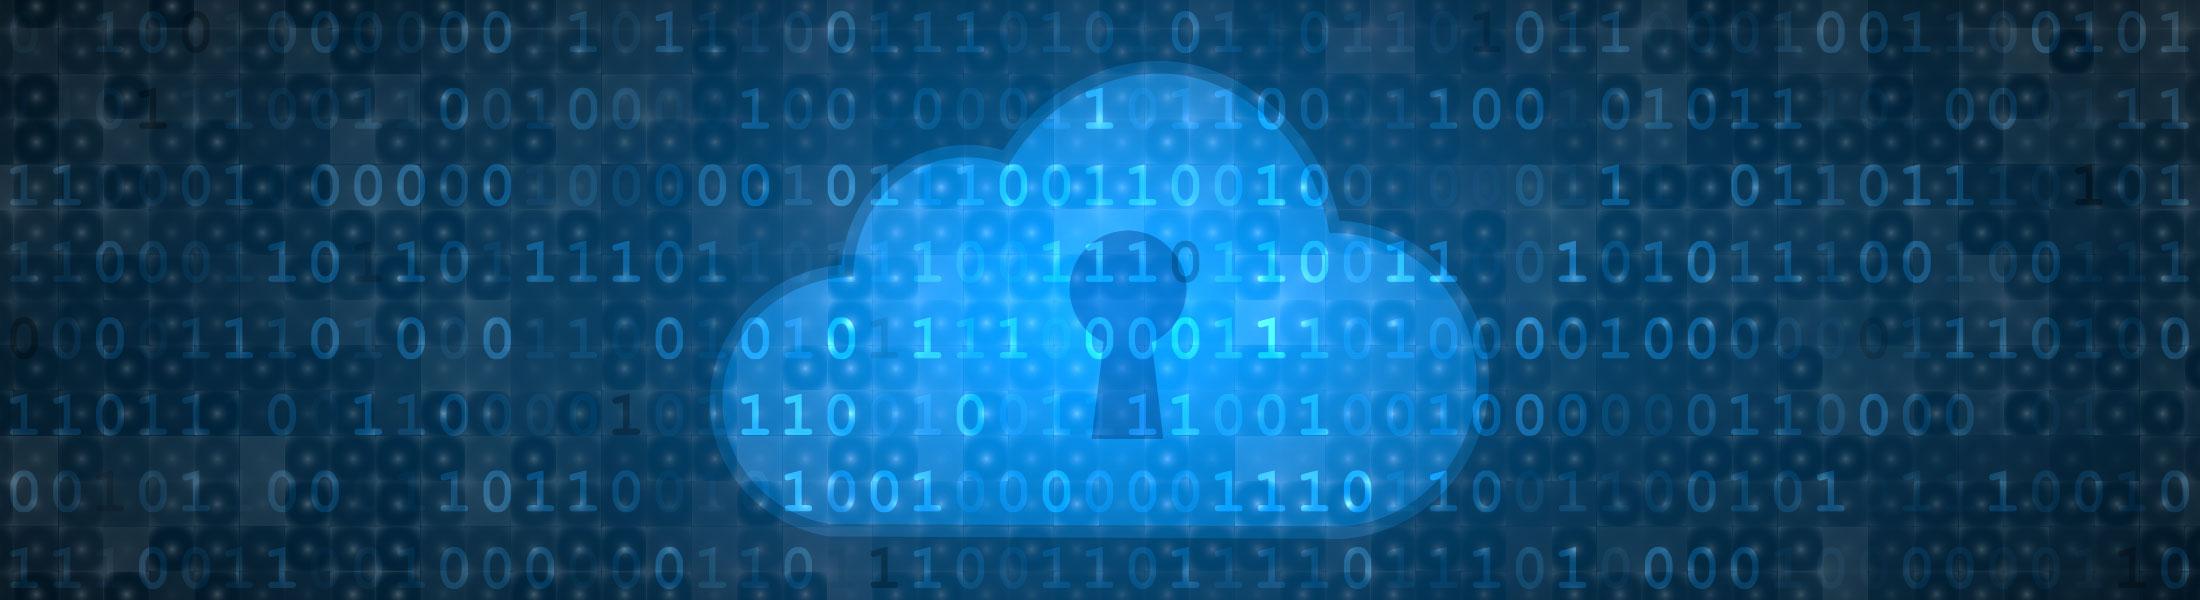 csn_header_privacypolicy